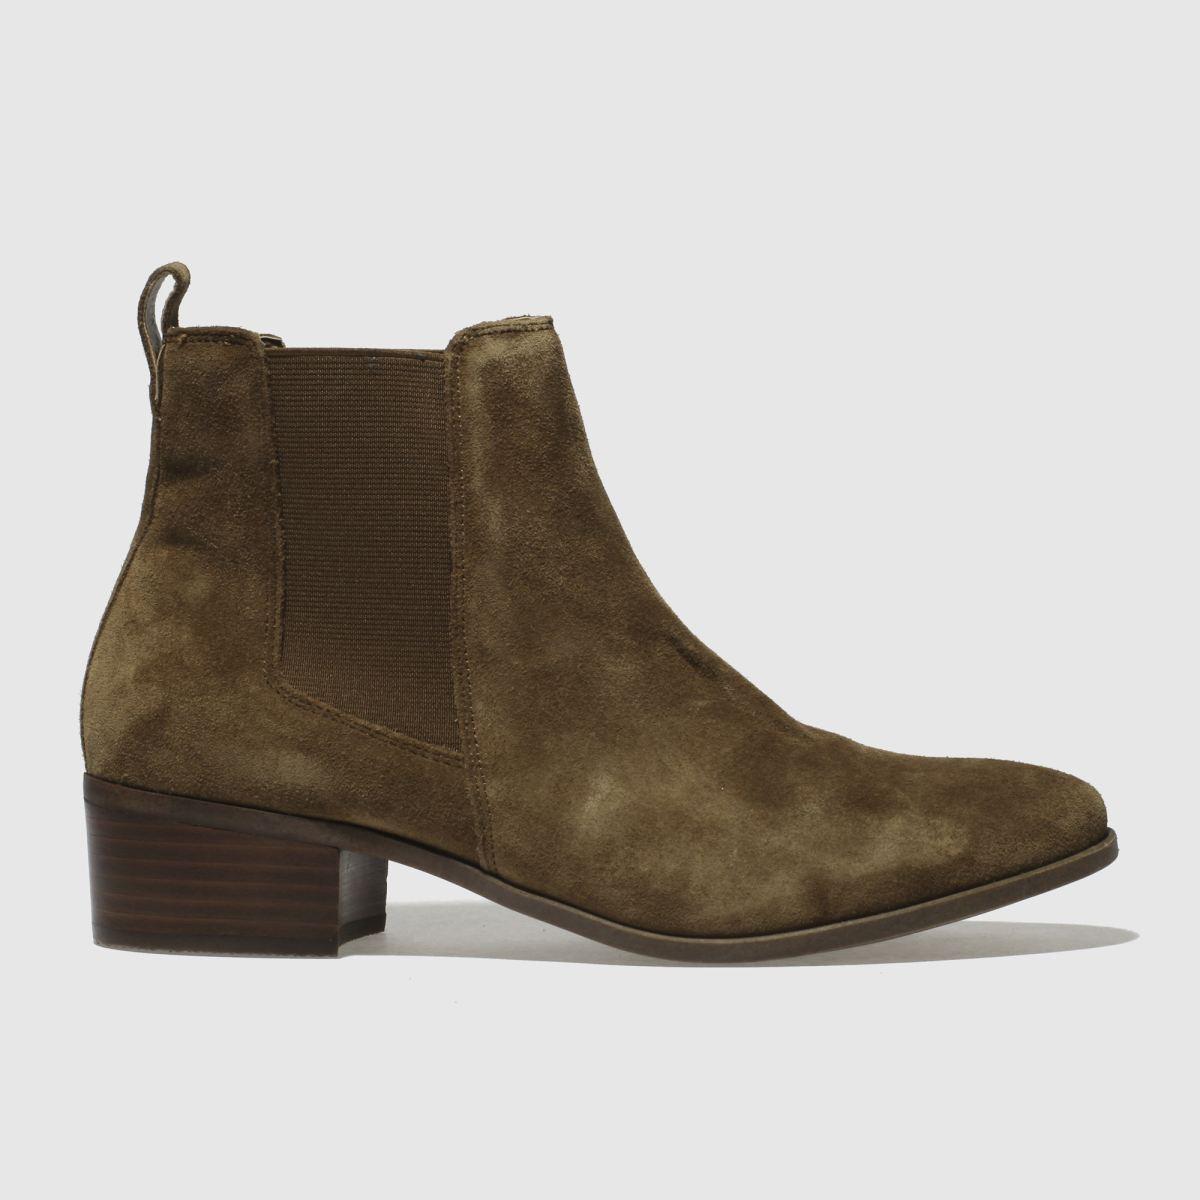 Schuh Tan Chillax Boots